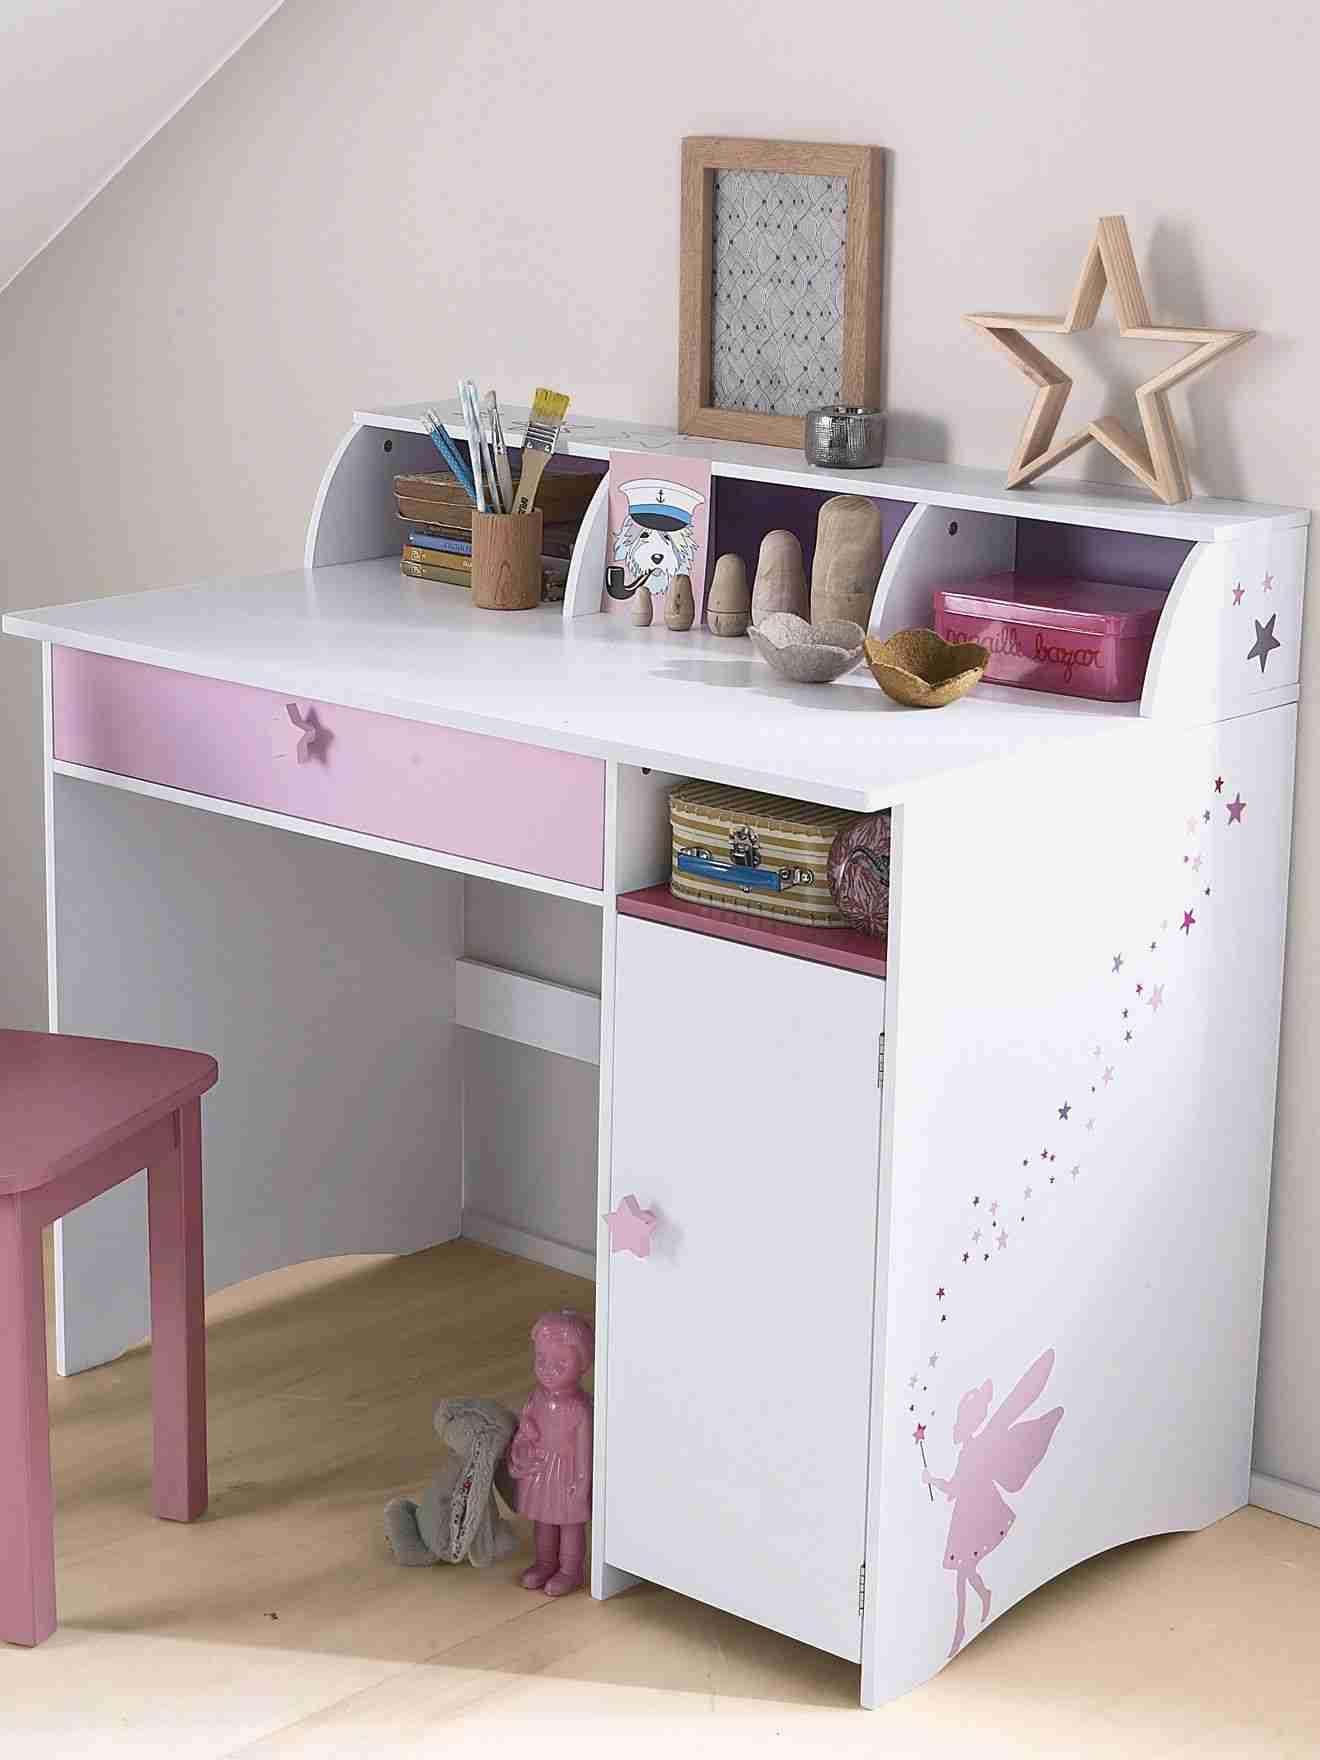 Vert Baudet Fille Impressionnant Galerie Mignon Bureau Fille Sp Cial Primaire Petite Fee Blanc Violet Bureaus